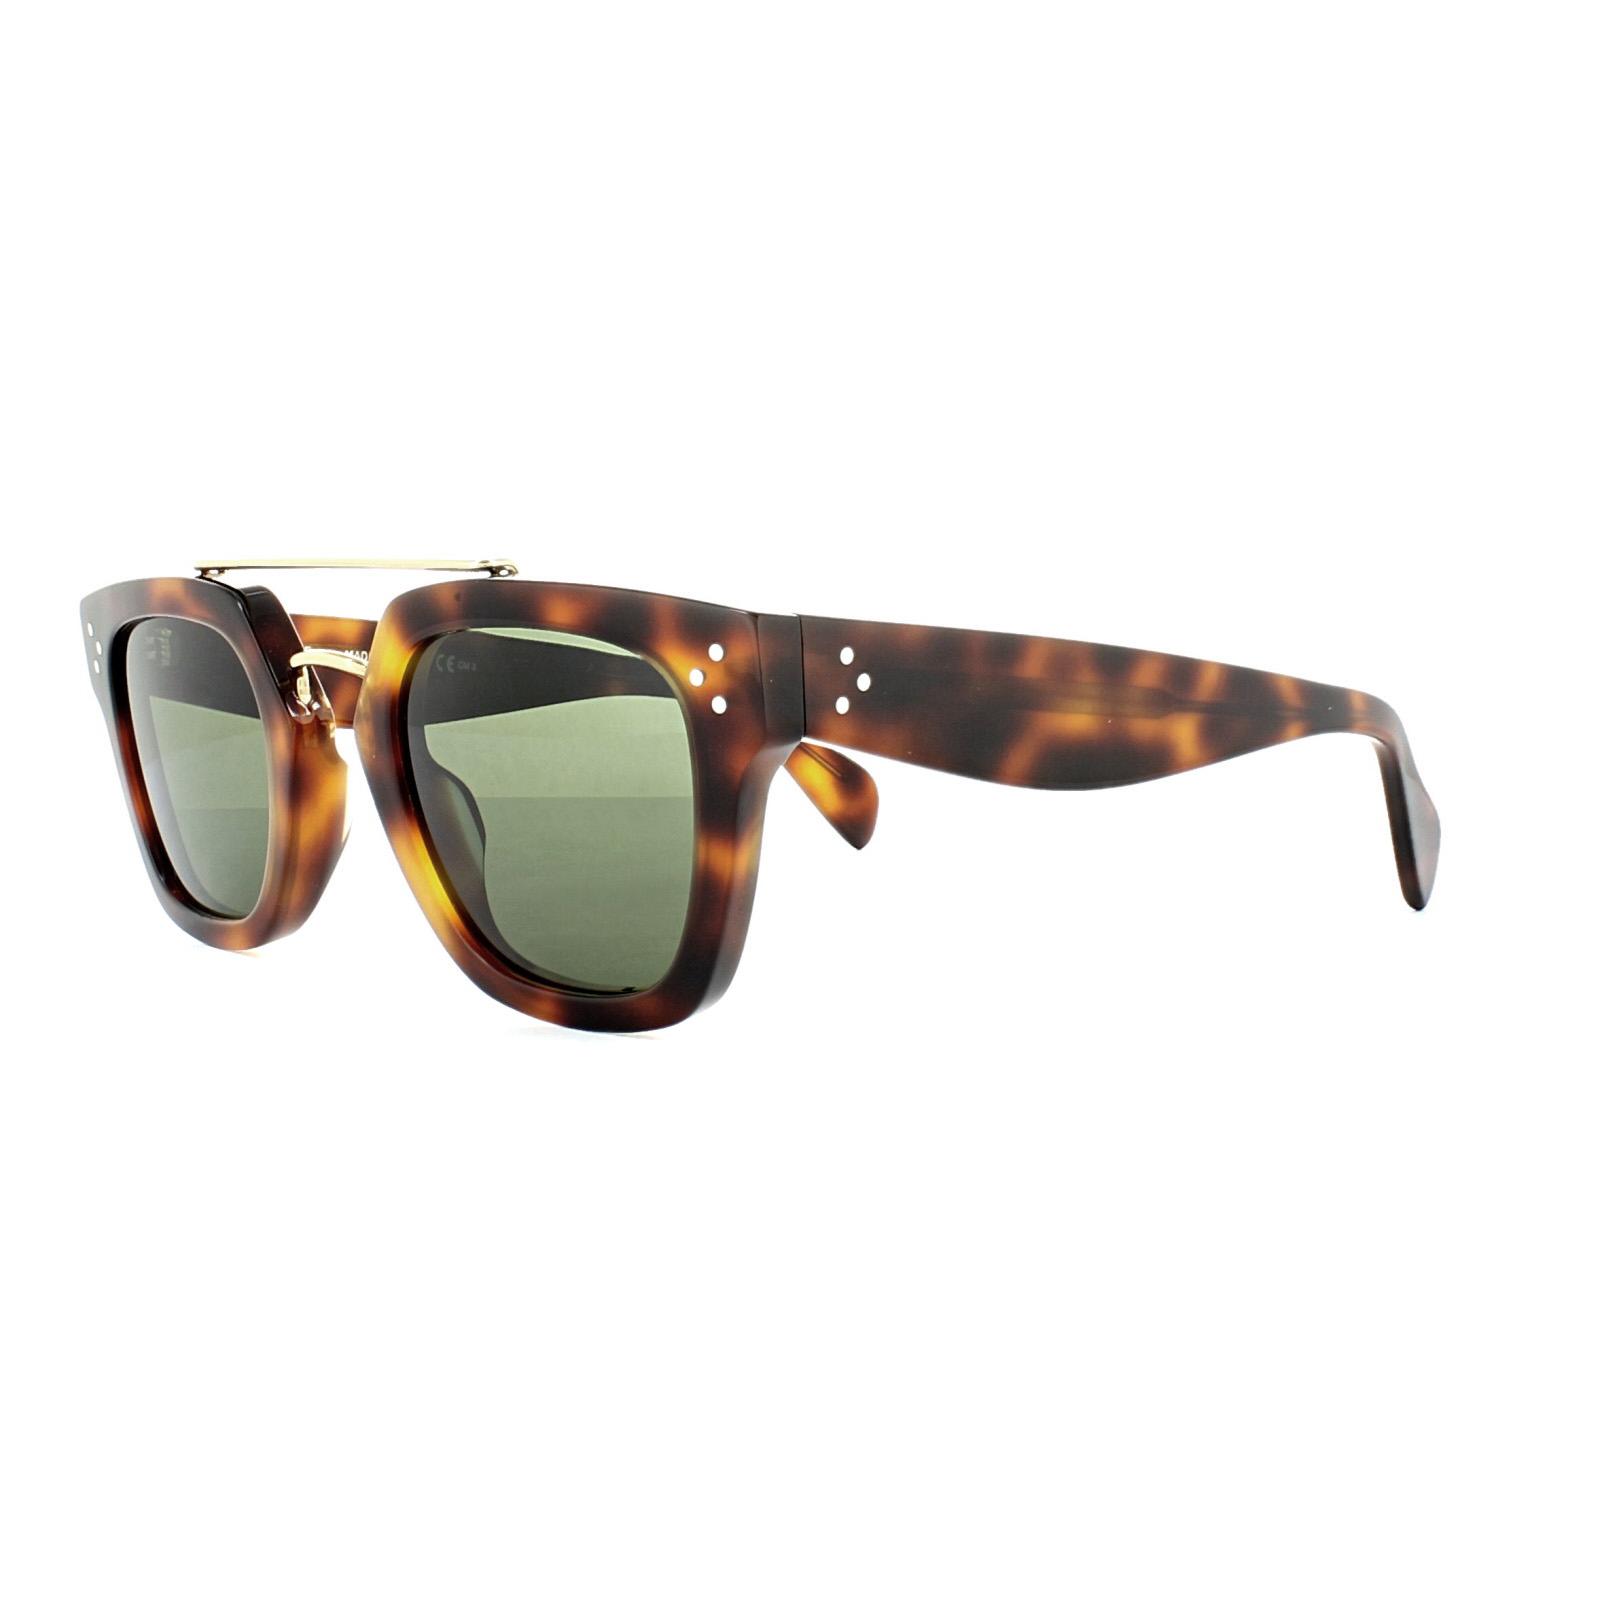 Cheap Celine 41077 S Bridge Sunglasses Discounted